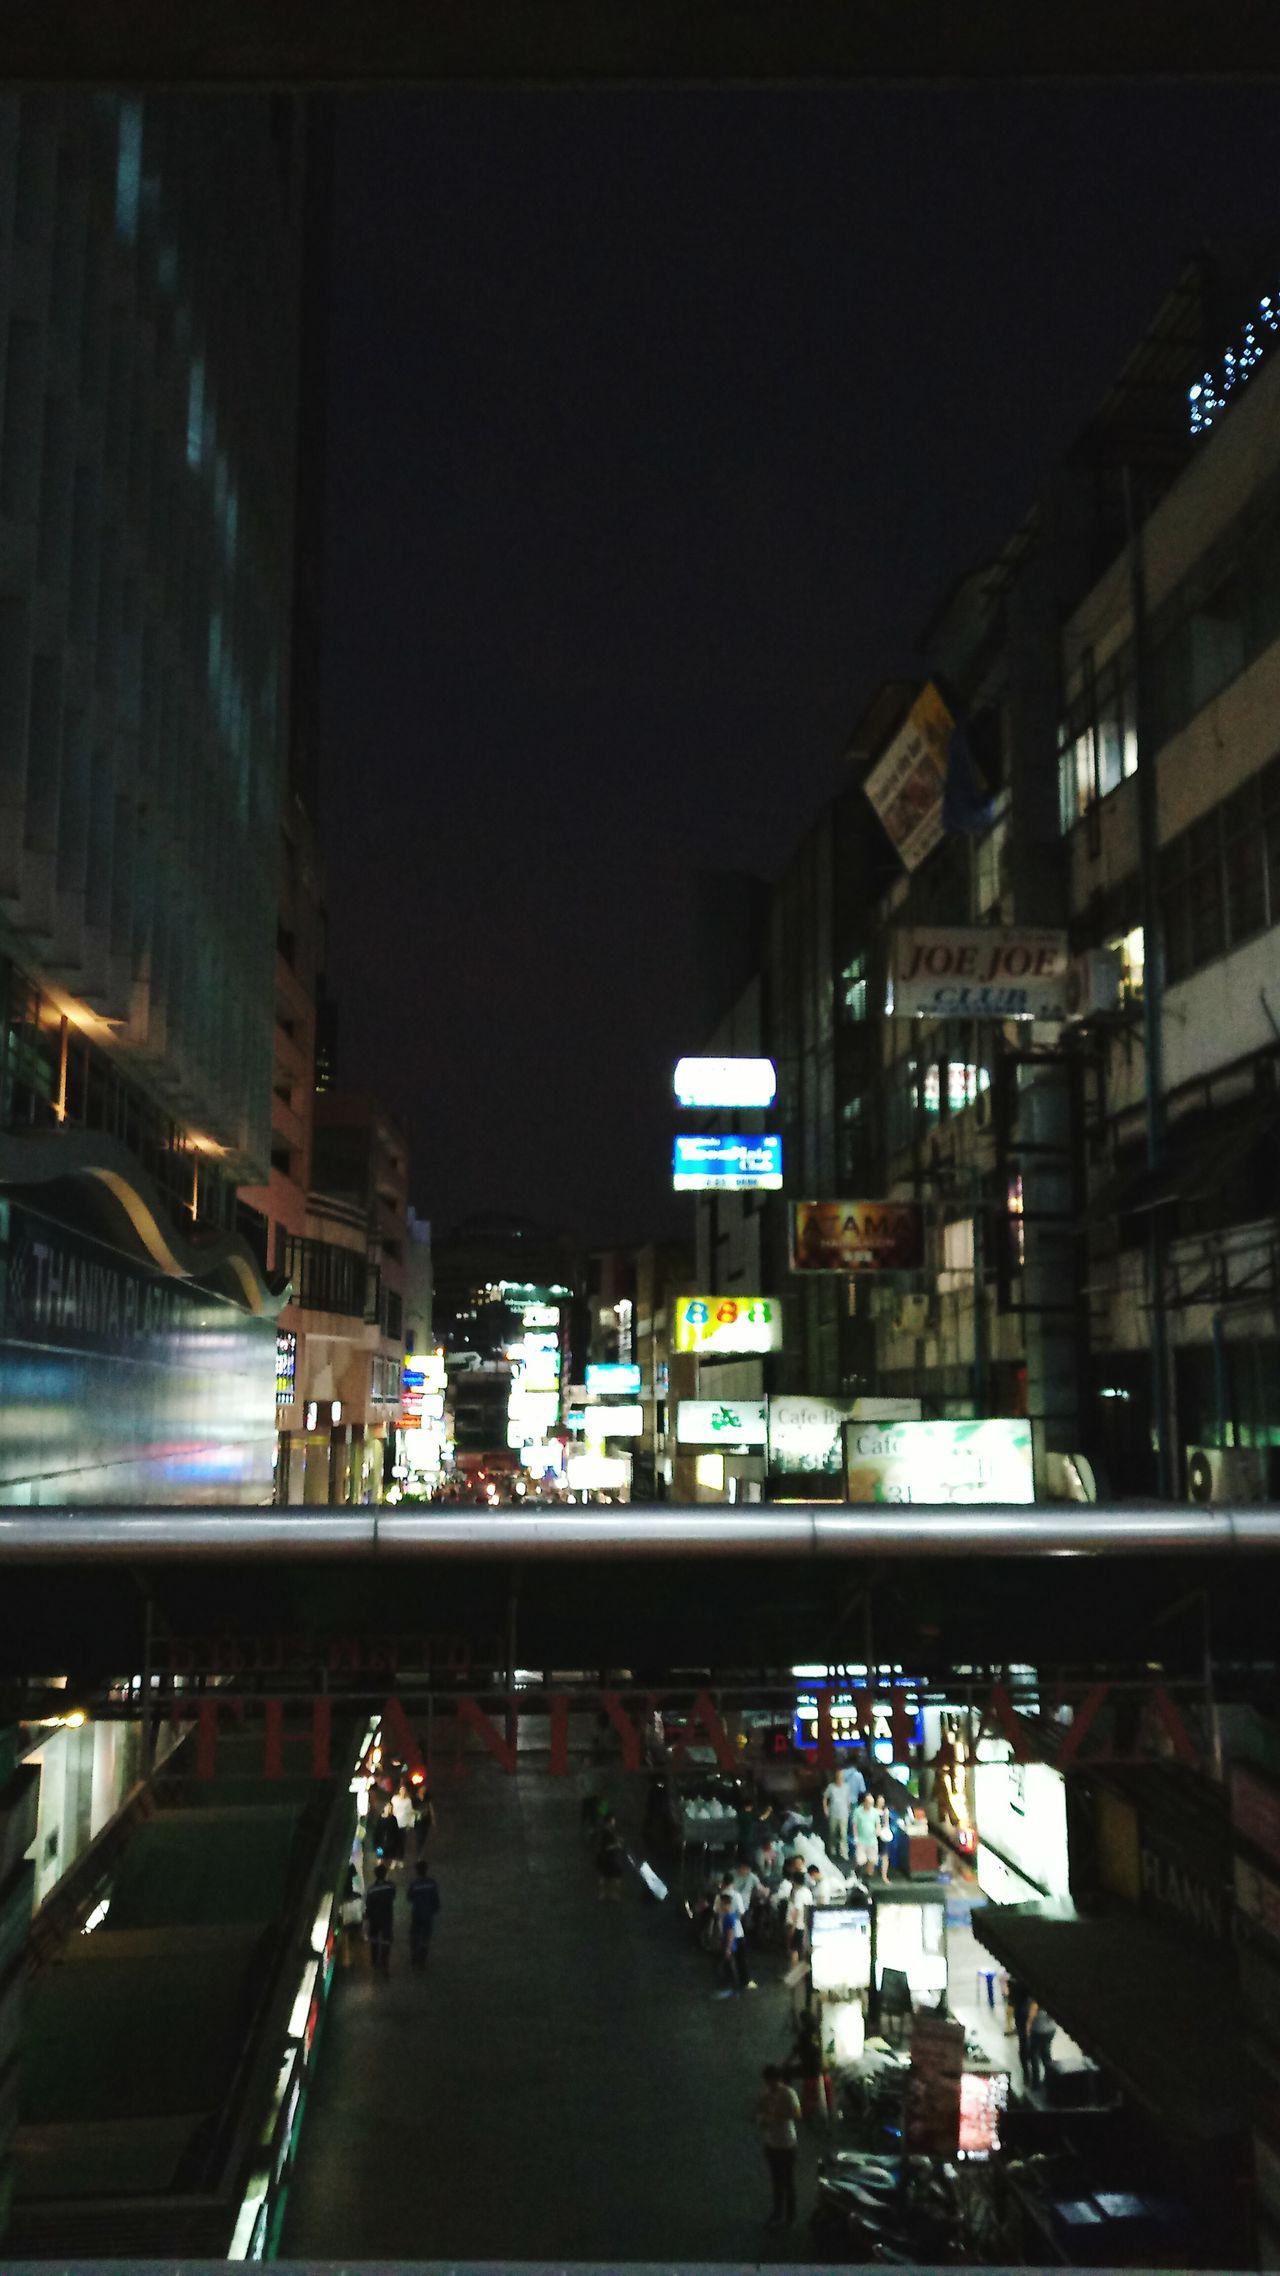 Illuminated Night Travel Destinations Silom, Thaniya Bangkok Thailand.